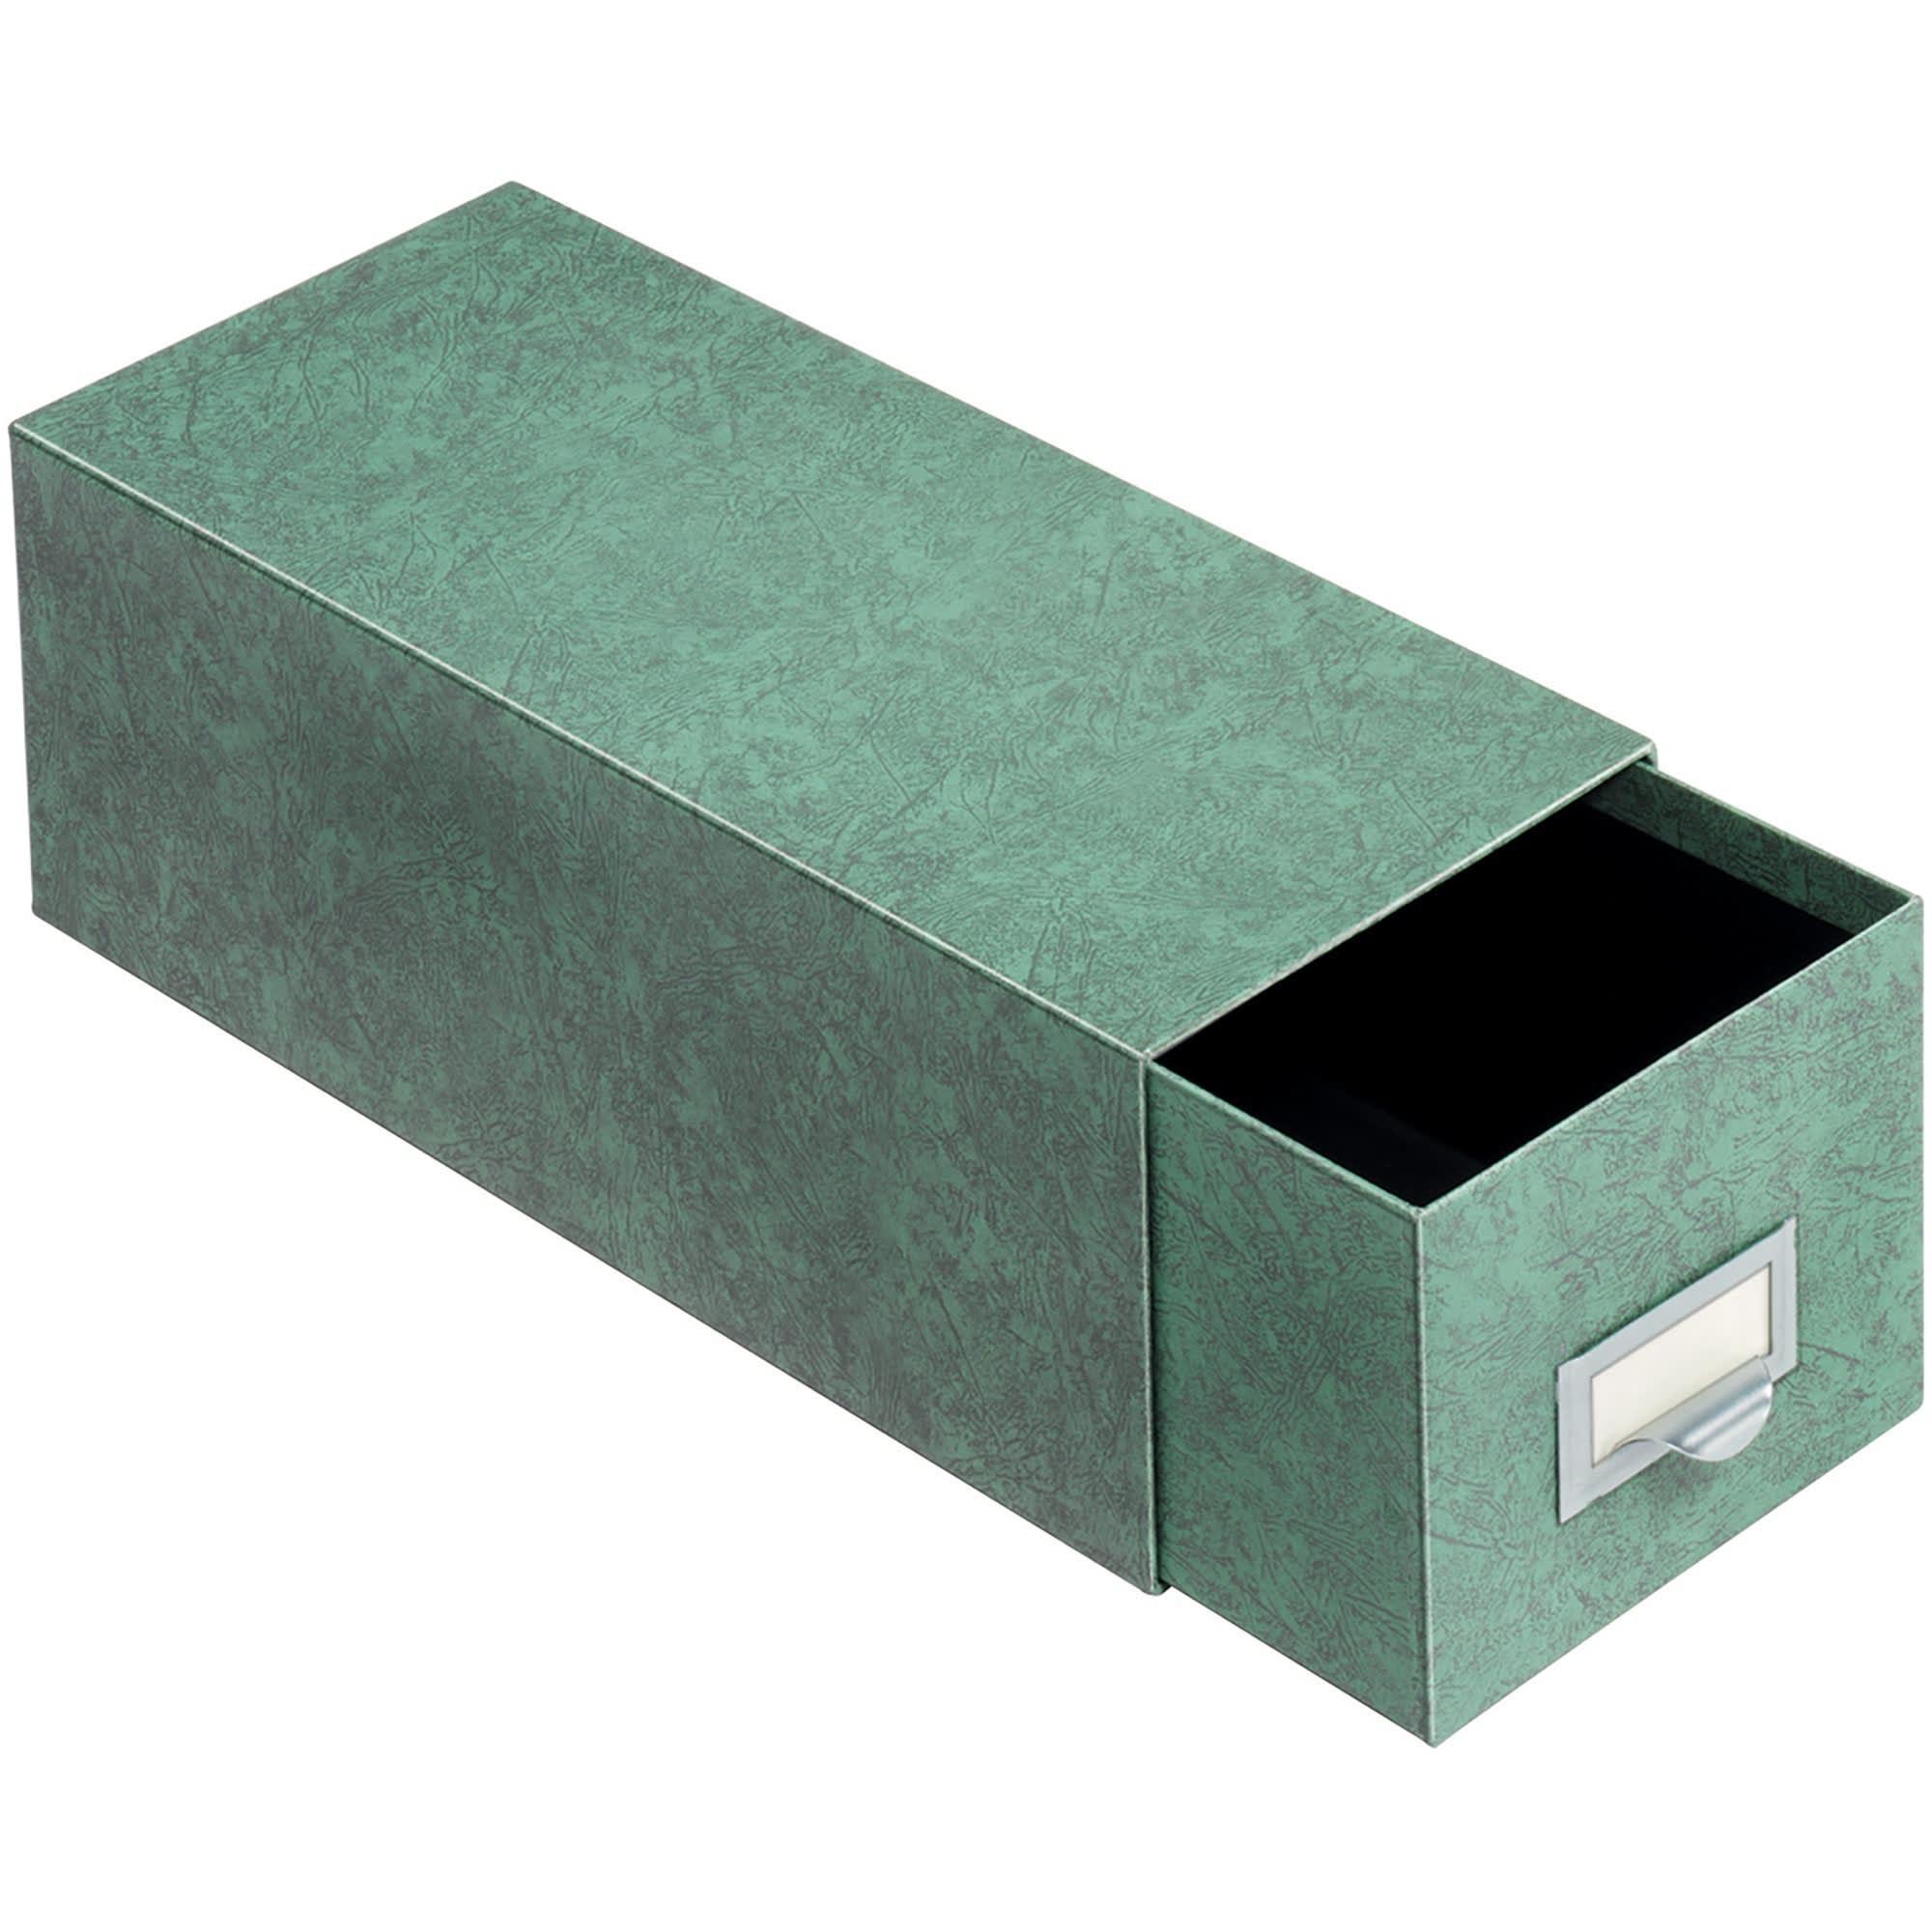 "Globe-Weis® 70% Recycled Index Card Storage Case, 4"" x 6"", Green"